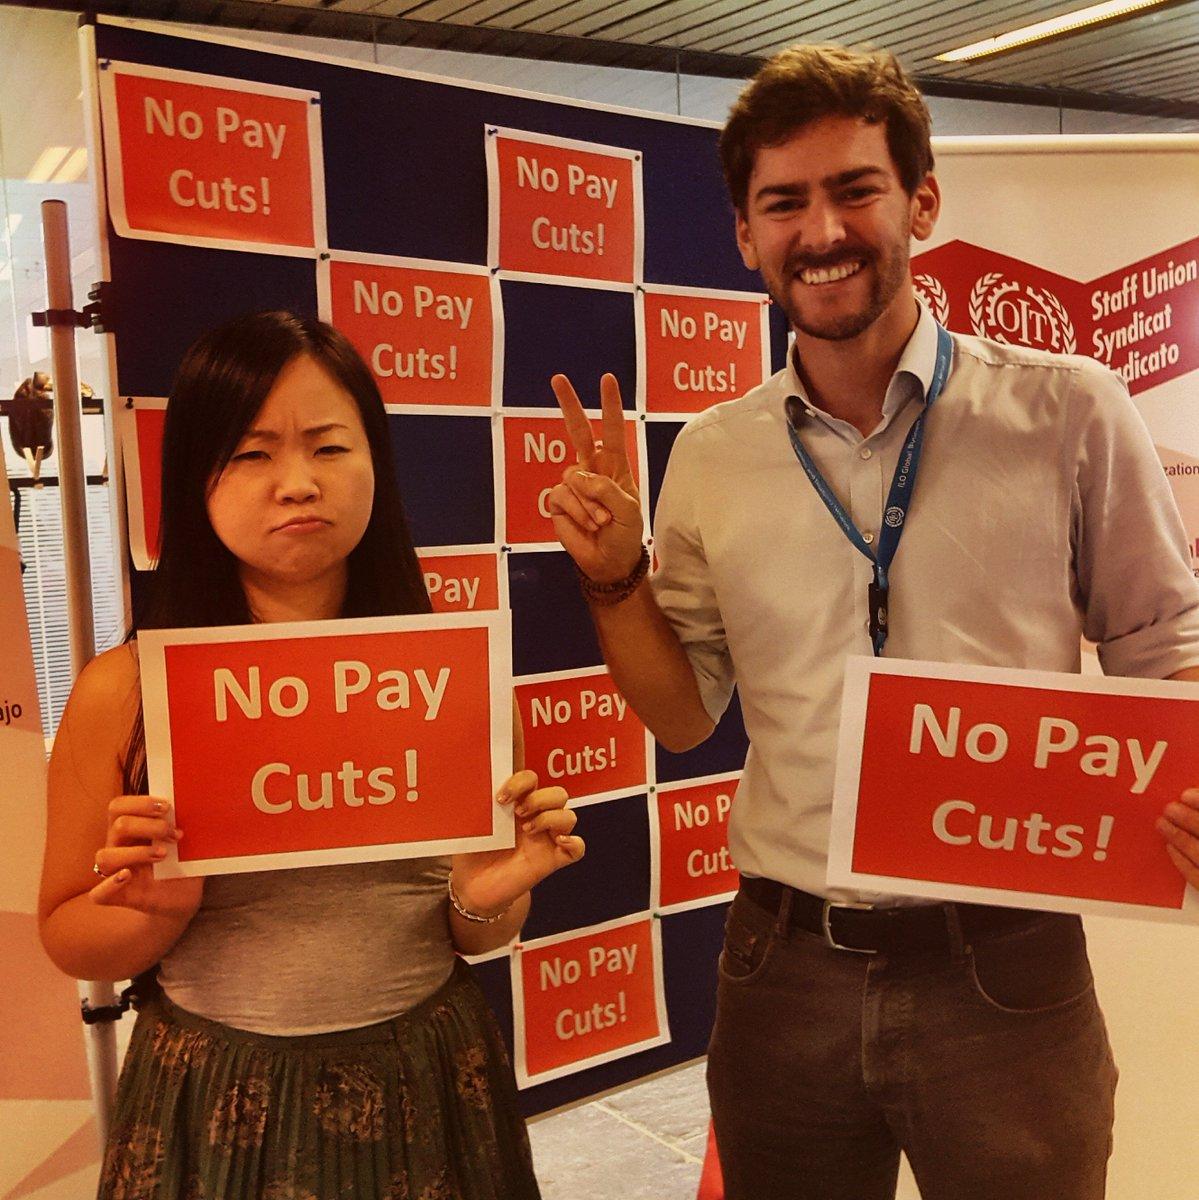 #NoUNPayCut ! Protect #workersrights @UN We need #dialogue &amp; #transparency @ILOUnionPres @FICSAHQ @UNGeneva<br>http://pic.twitter.com/MShvf3Ba3m